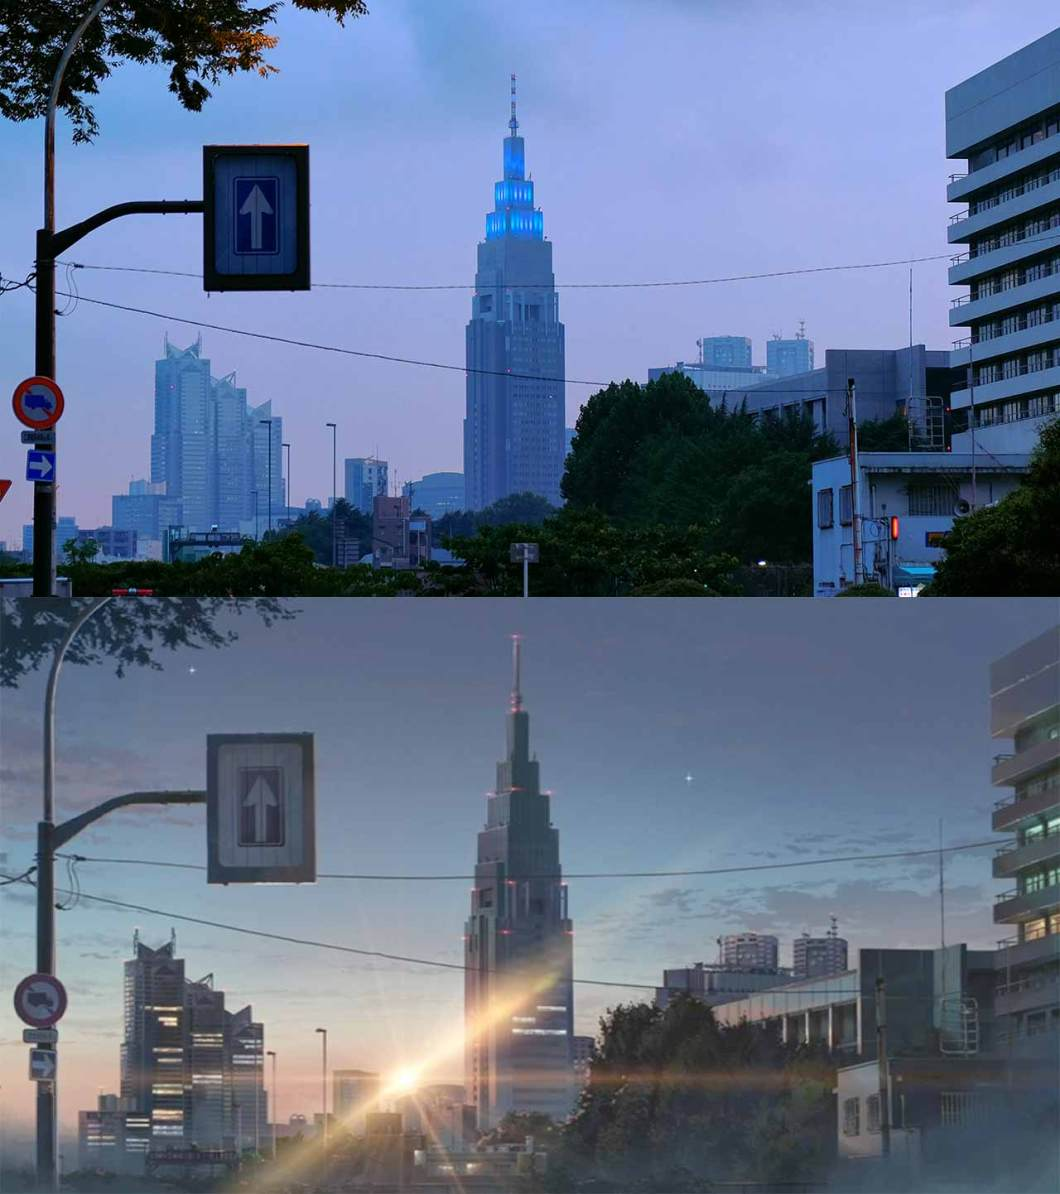 ntt docomo tower in shinjuku